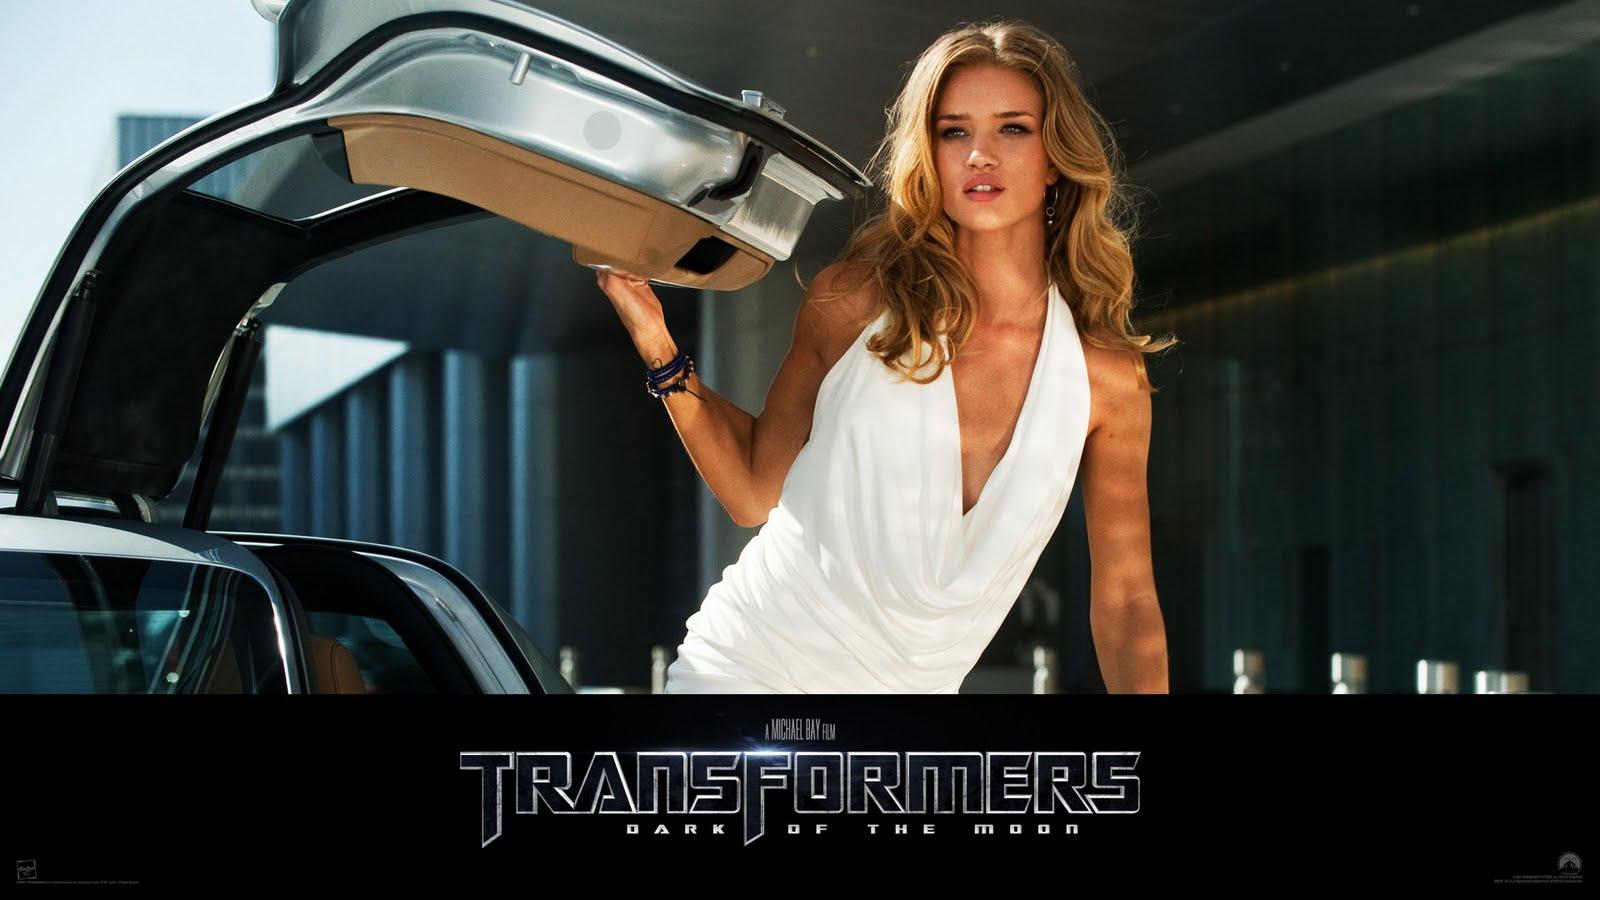 http://4.bp.blogspot.com/-w41sHMN12RE/Tgui2sdgvaI/AAAAAAAAAQk/SBWc41m4JEE/s1600/Transformers%2B3%252C%2BDark%2Bof%2Bthe%2BMoon%252C%2BRosie%2BHuntington-Whiteley.jpg